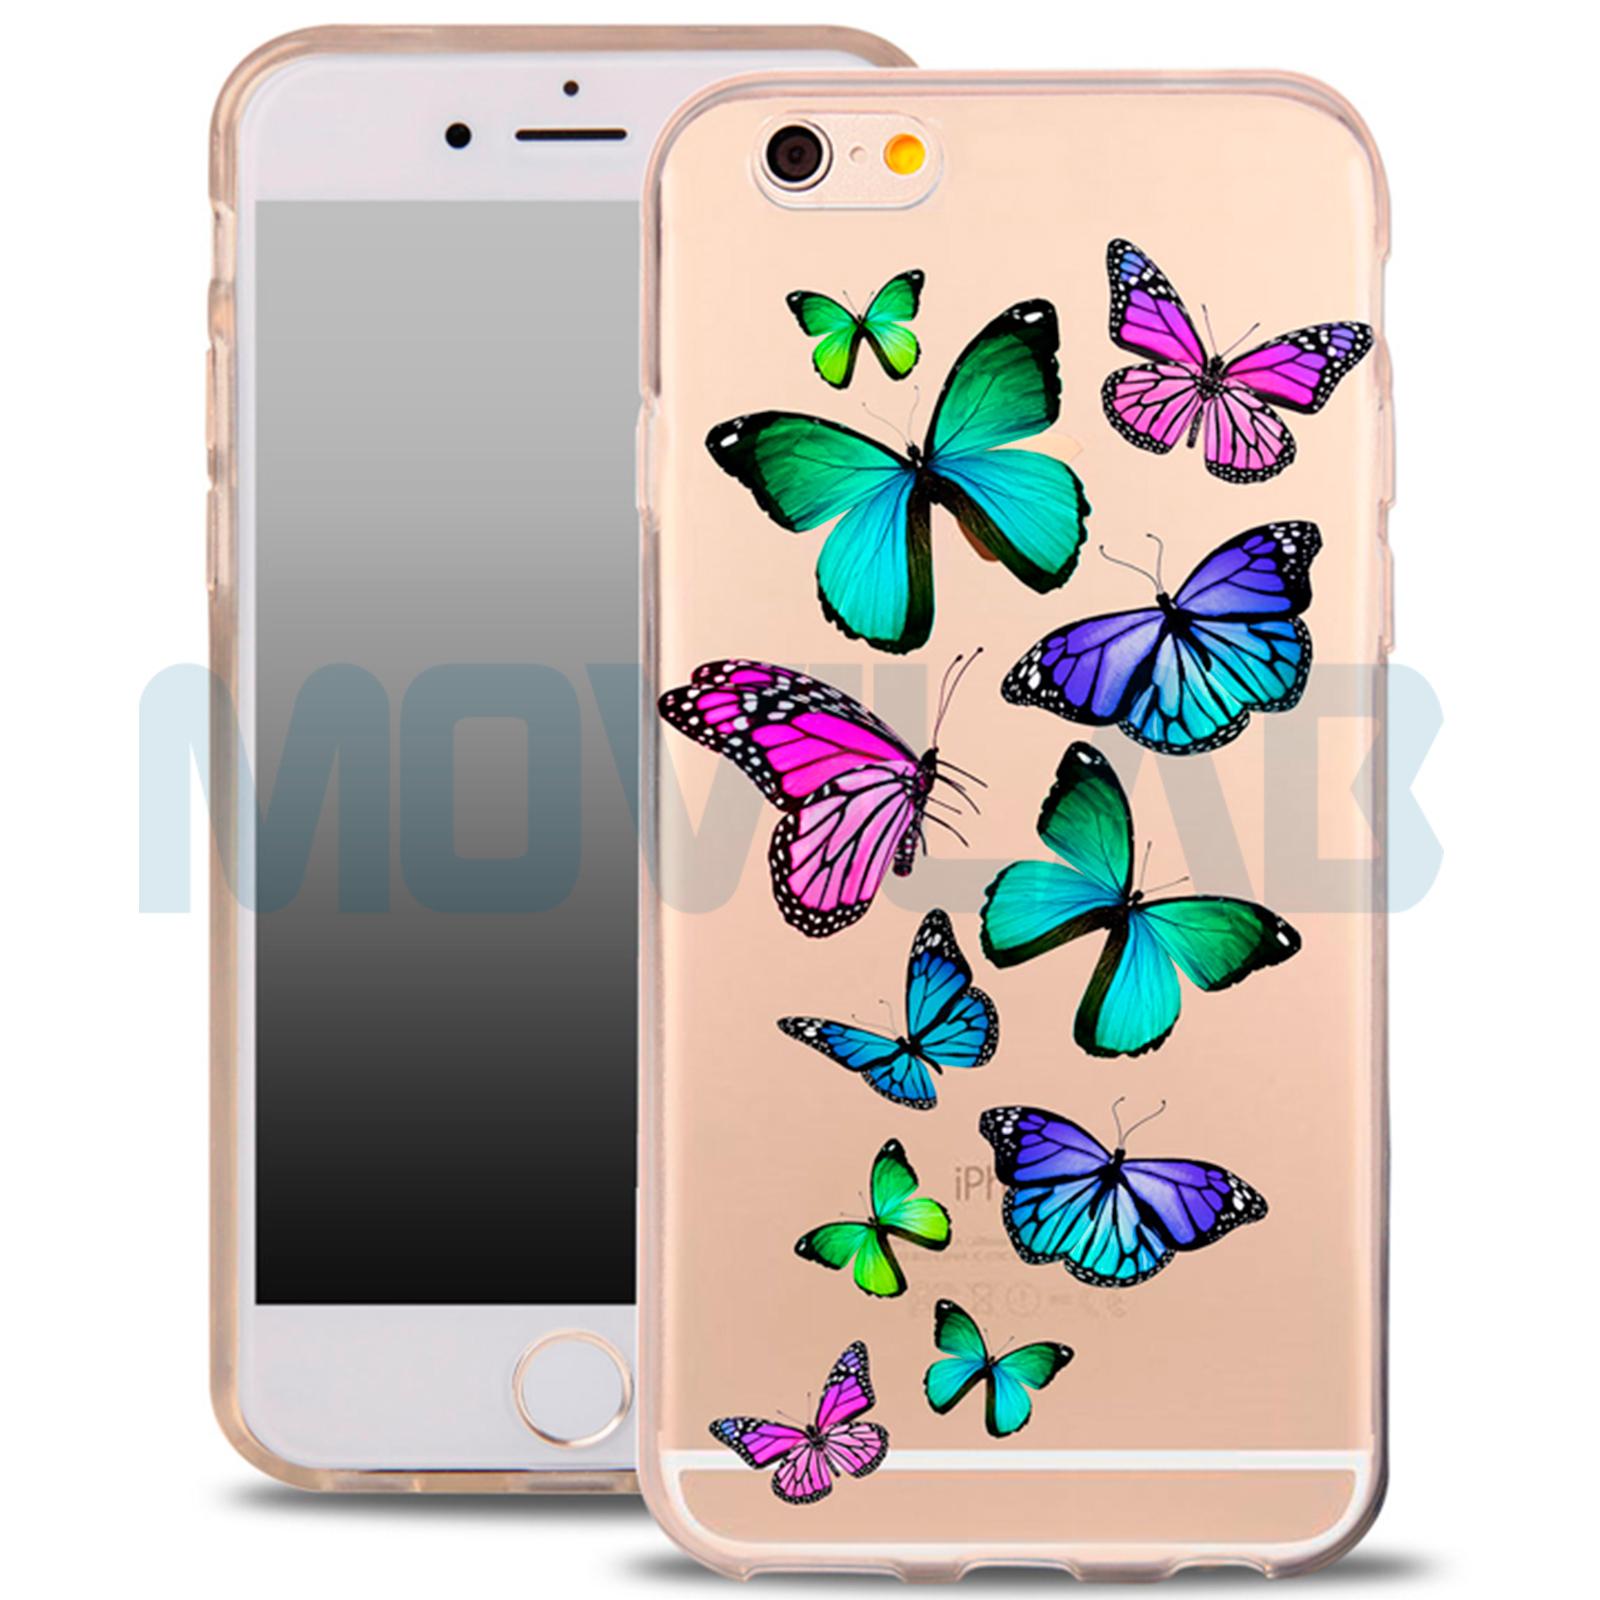 Funda gel Iphone 6 / 6S mariposas